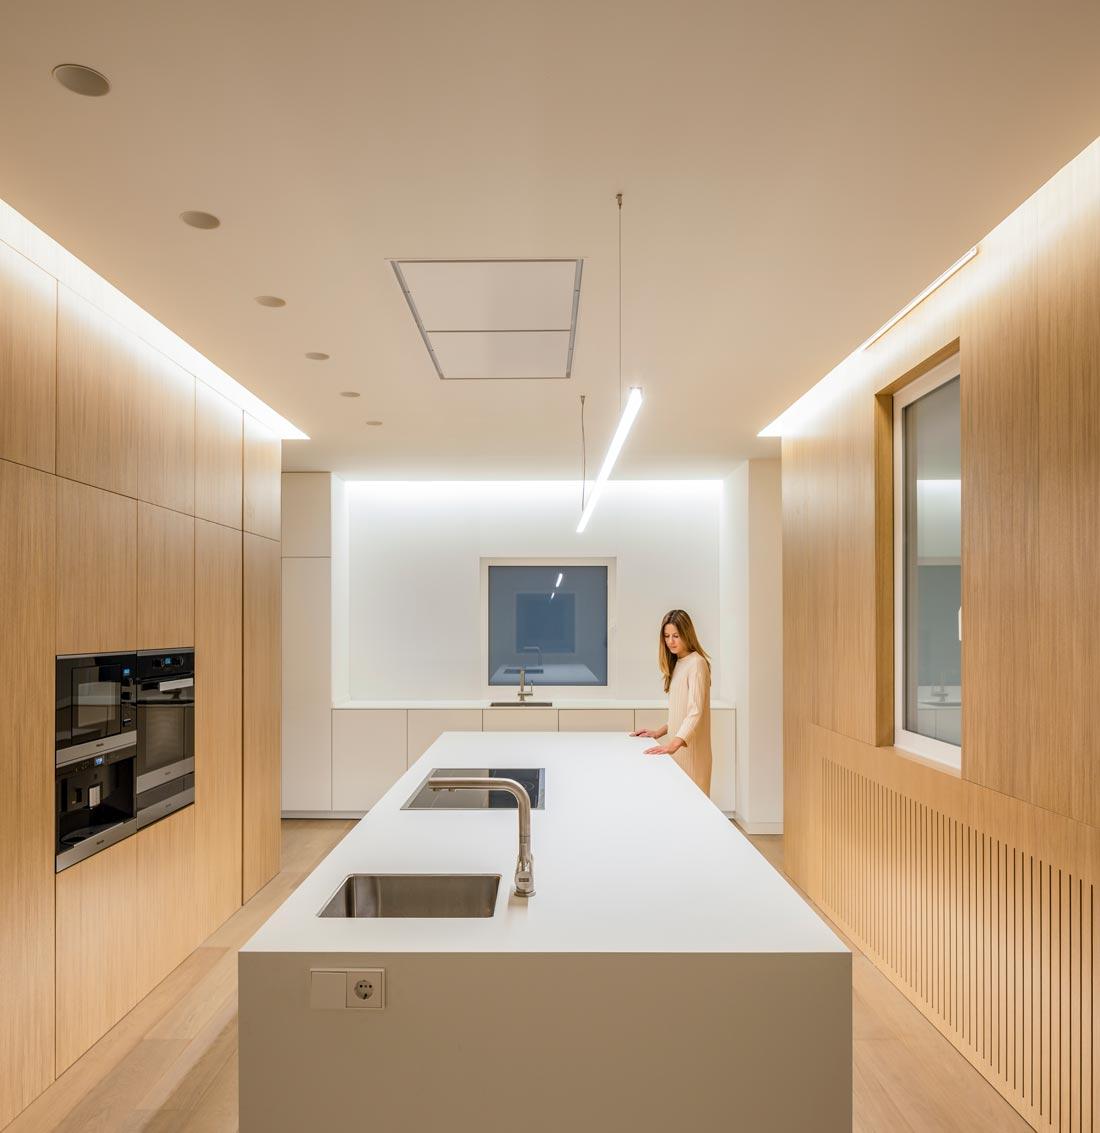 mayordomo architecture homu spanish architects kitchen island